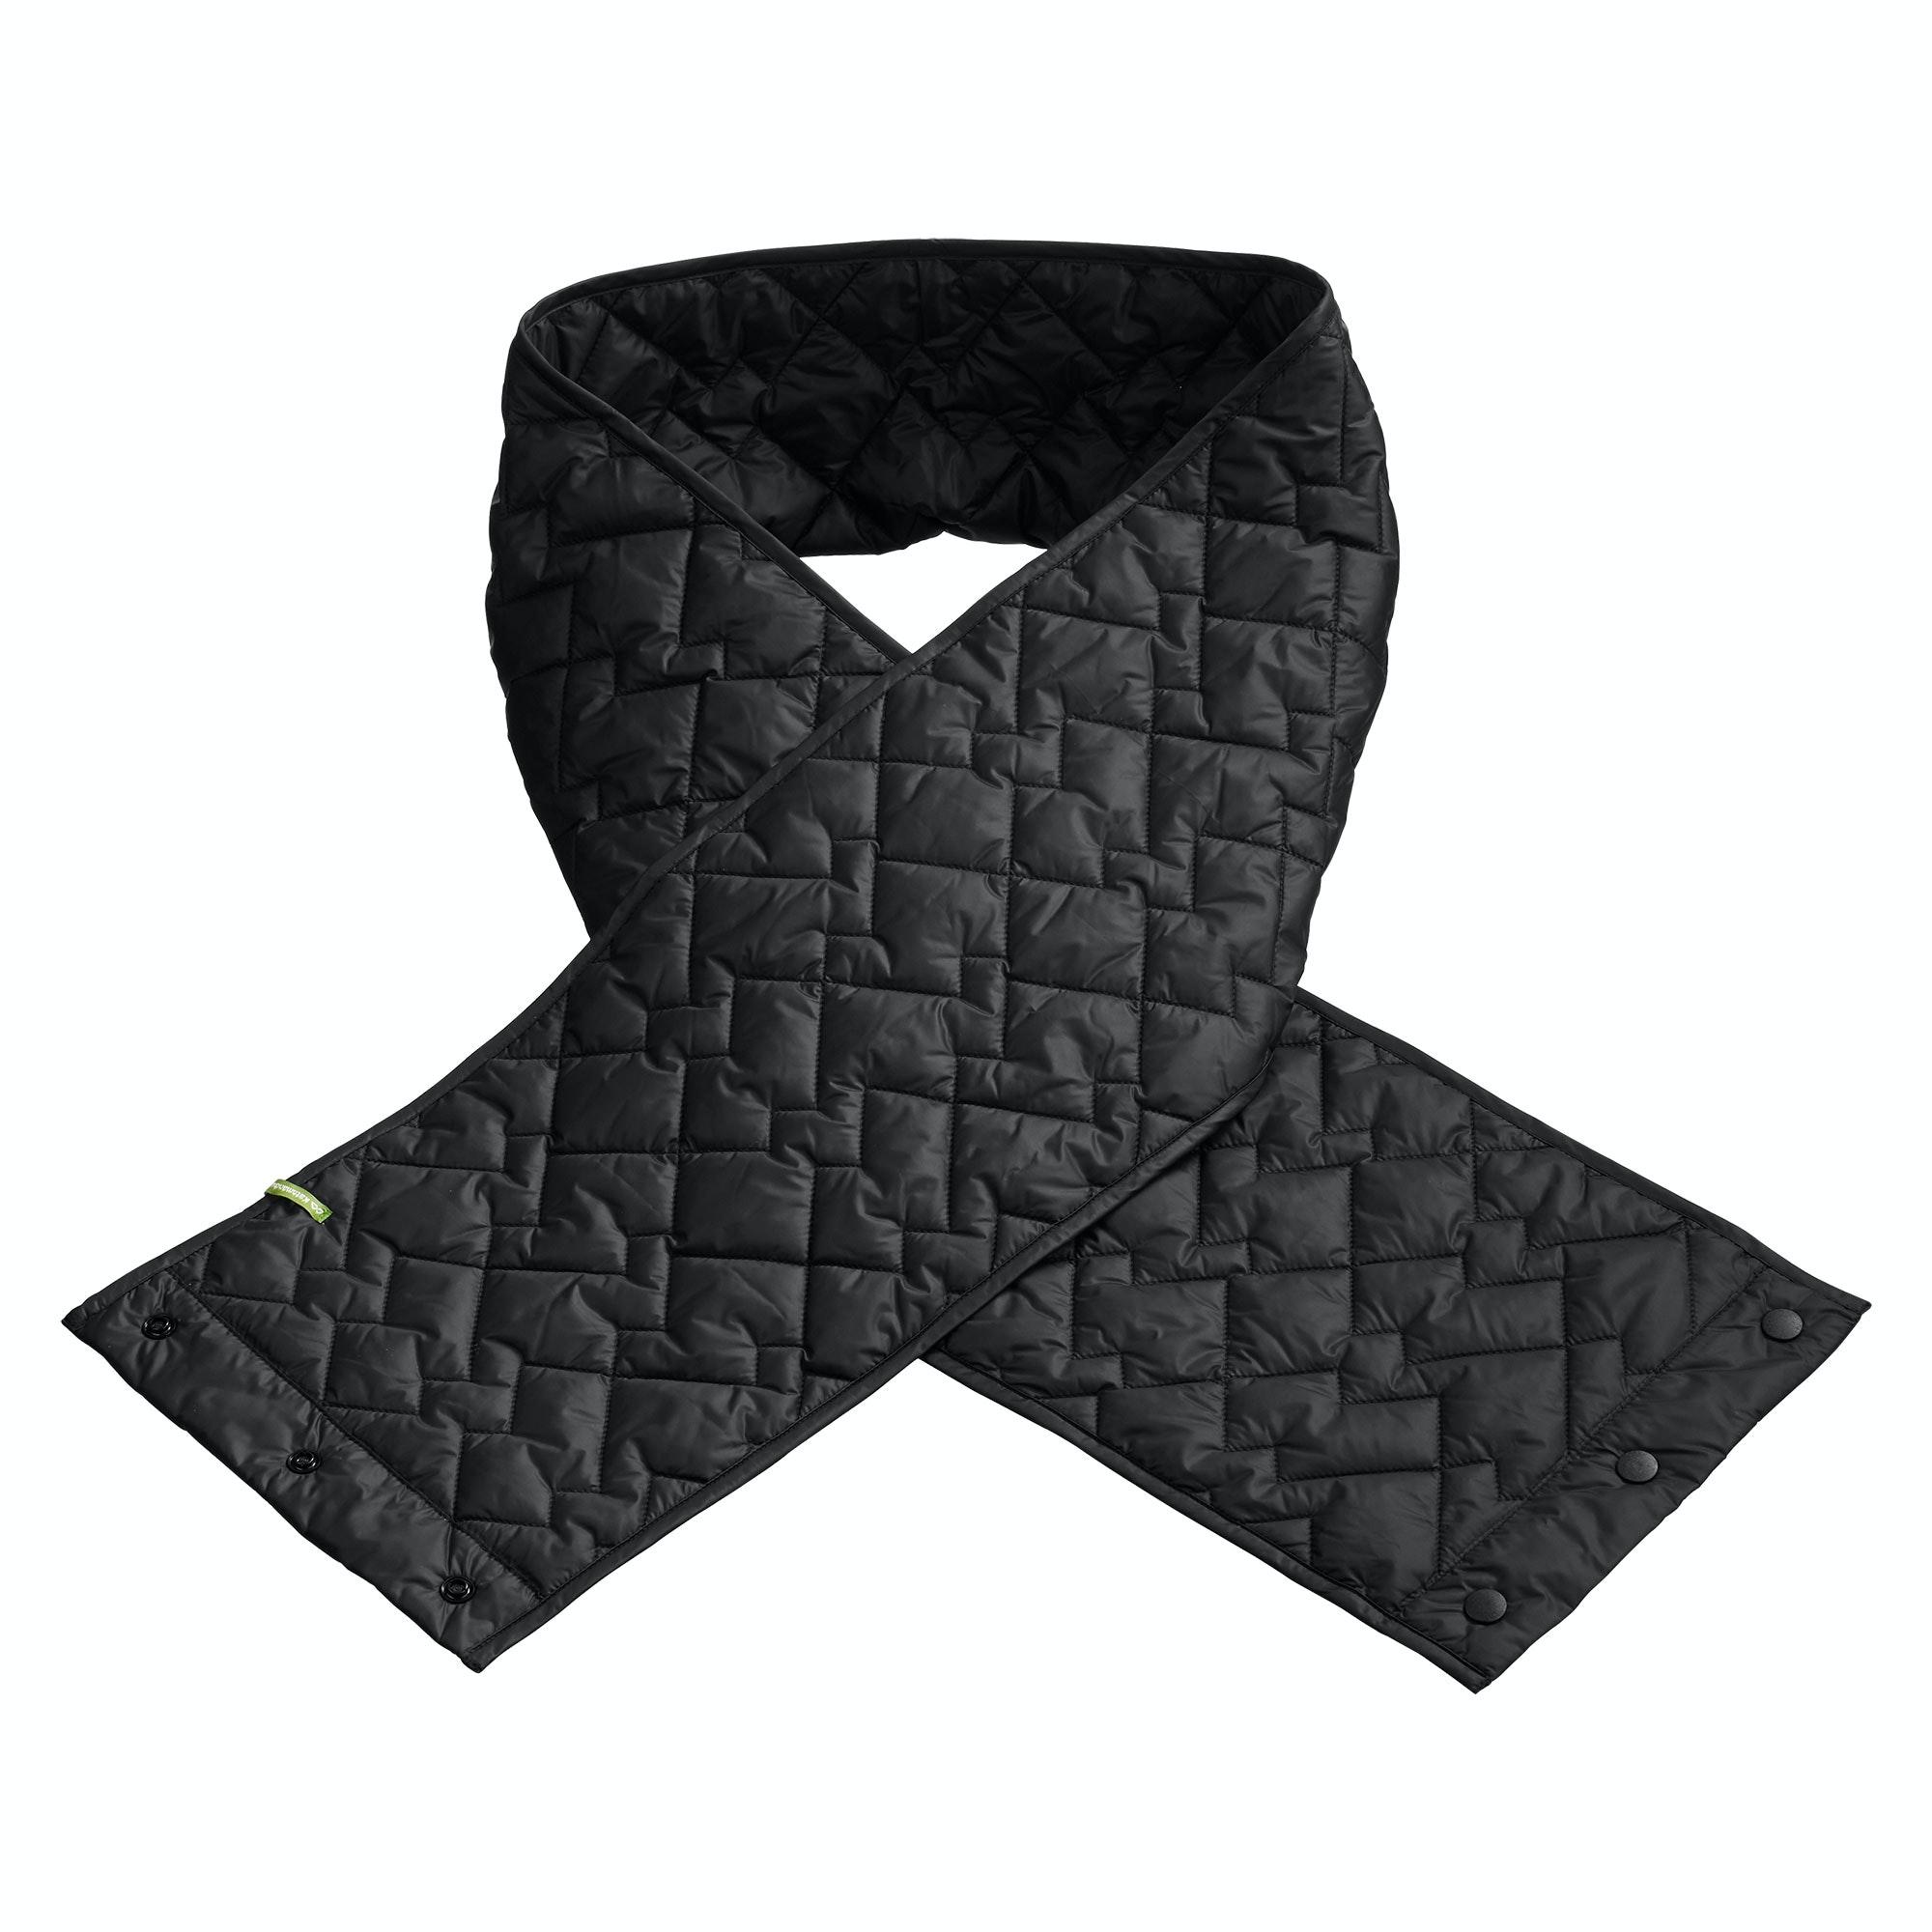 designs infinity model black sherpa for lined shot herika women nirvanna mens site scarf